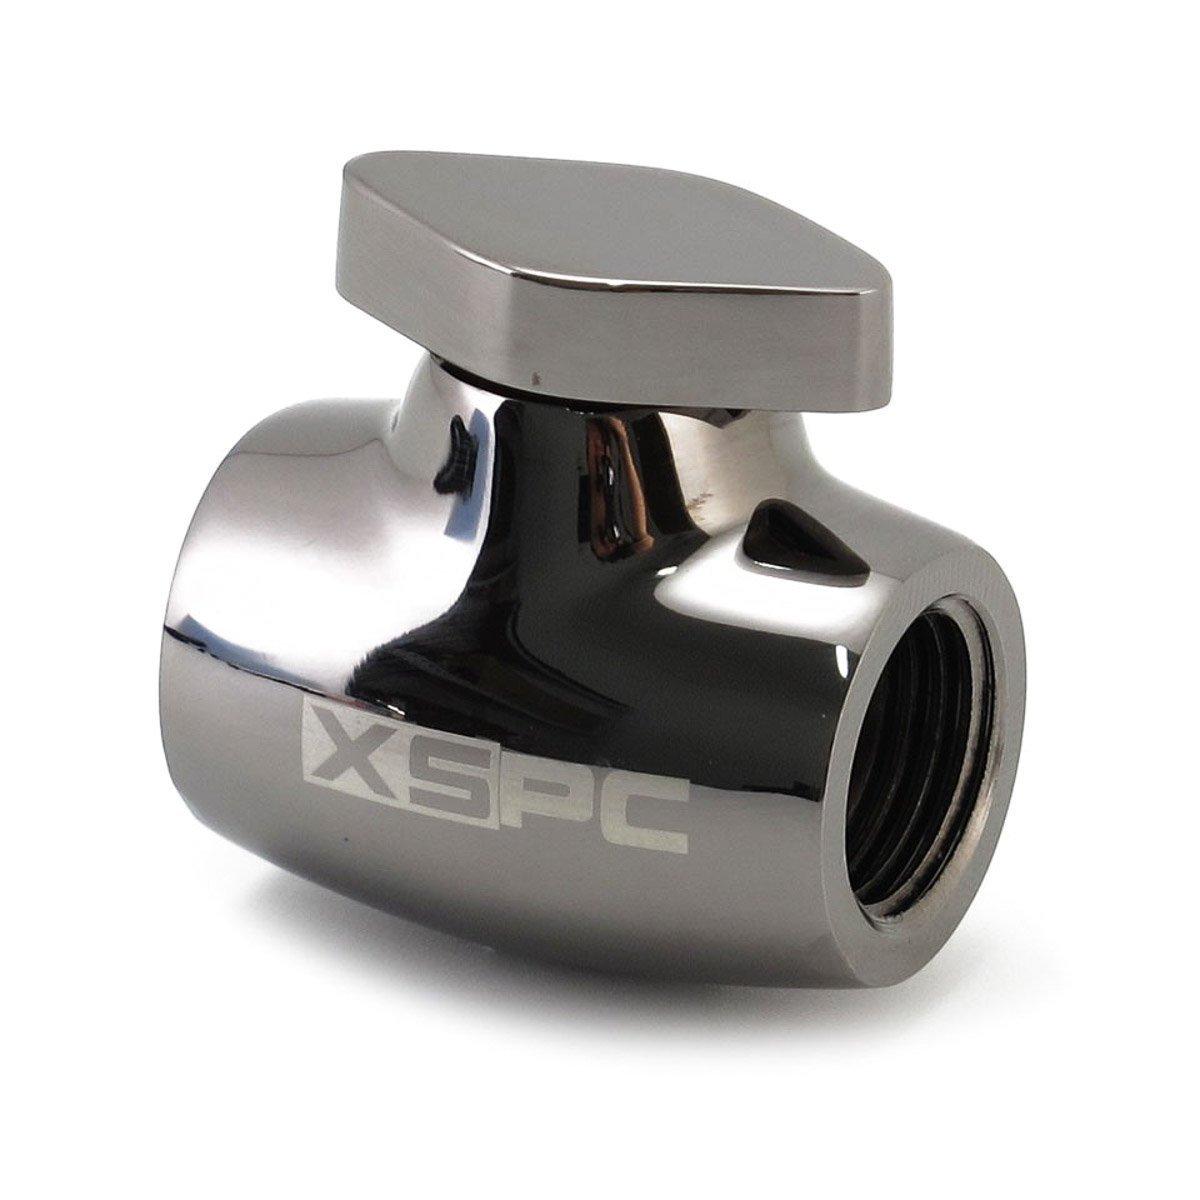 XSPC G1/4'' Ball Valve, Black Chrome